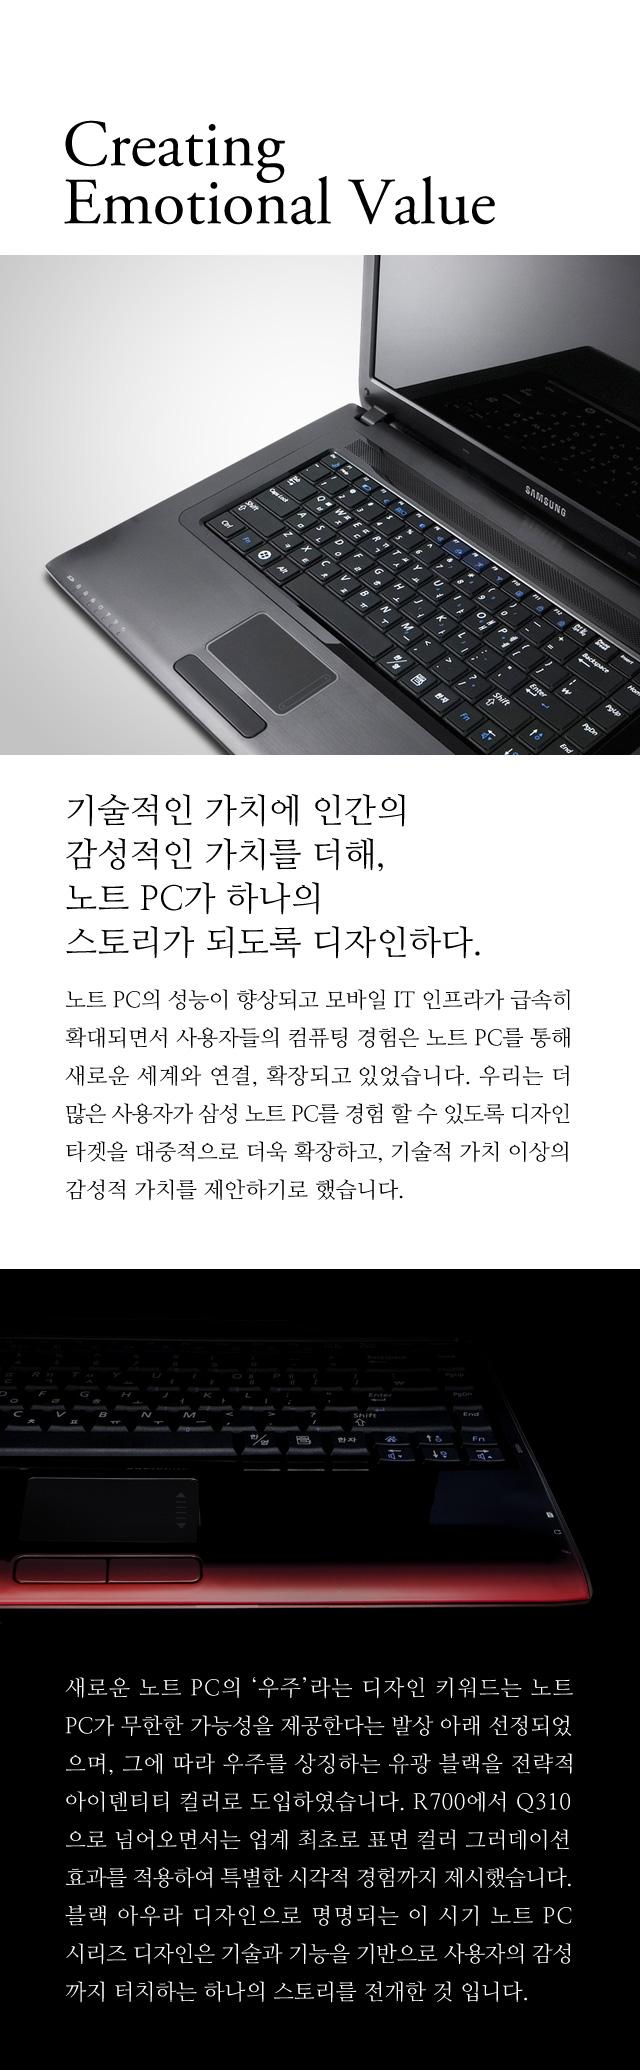 Samsung Note PC Design History